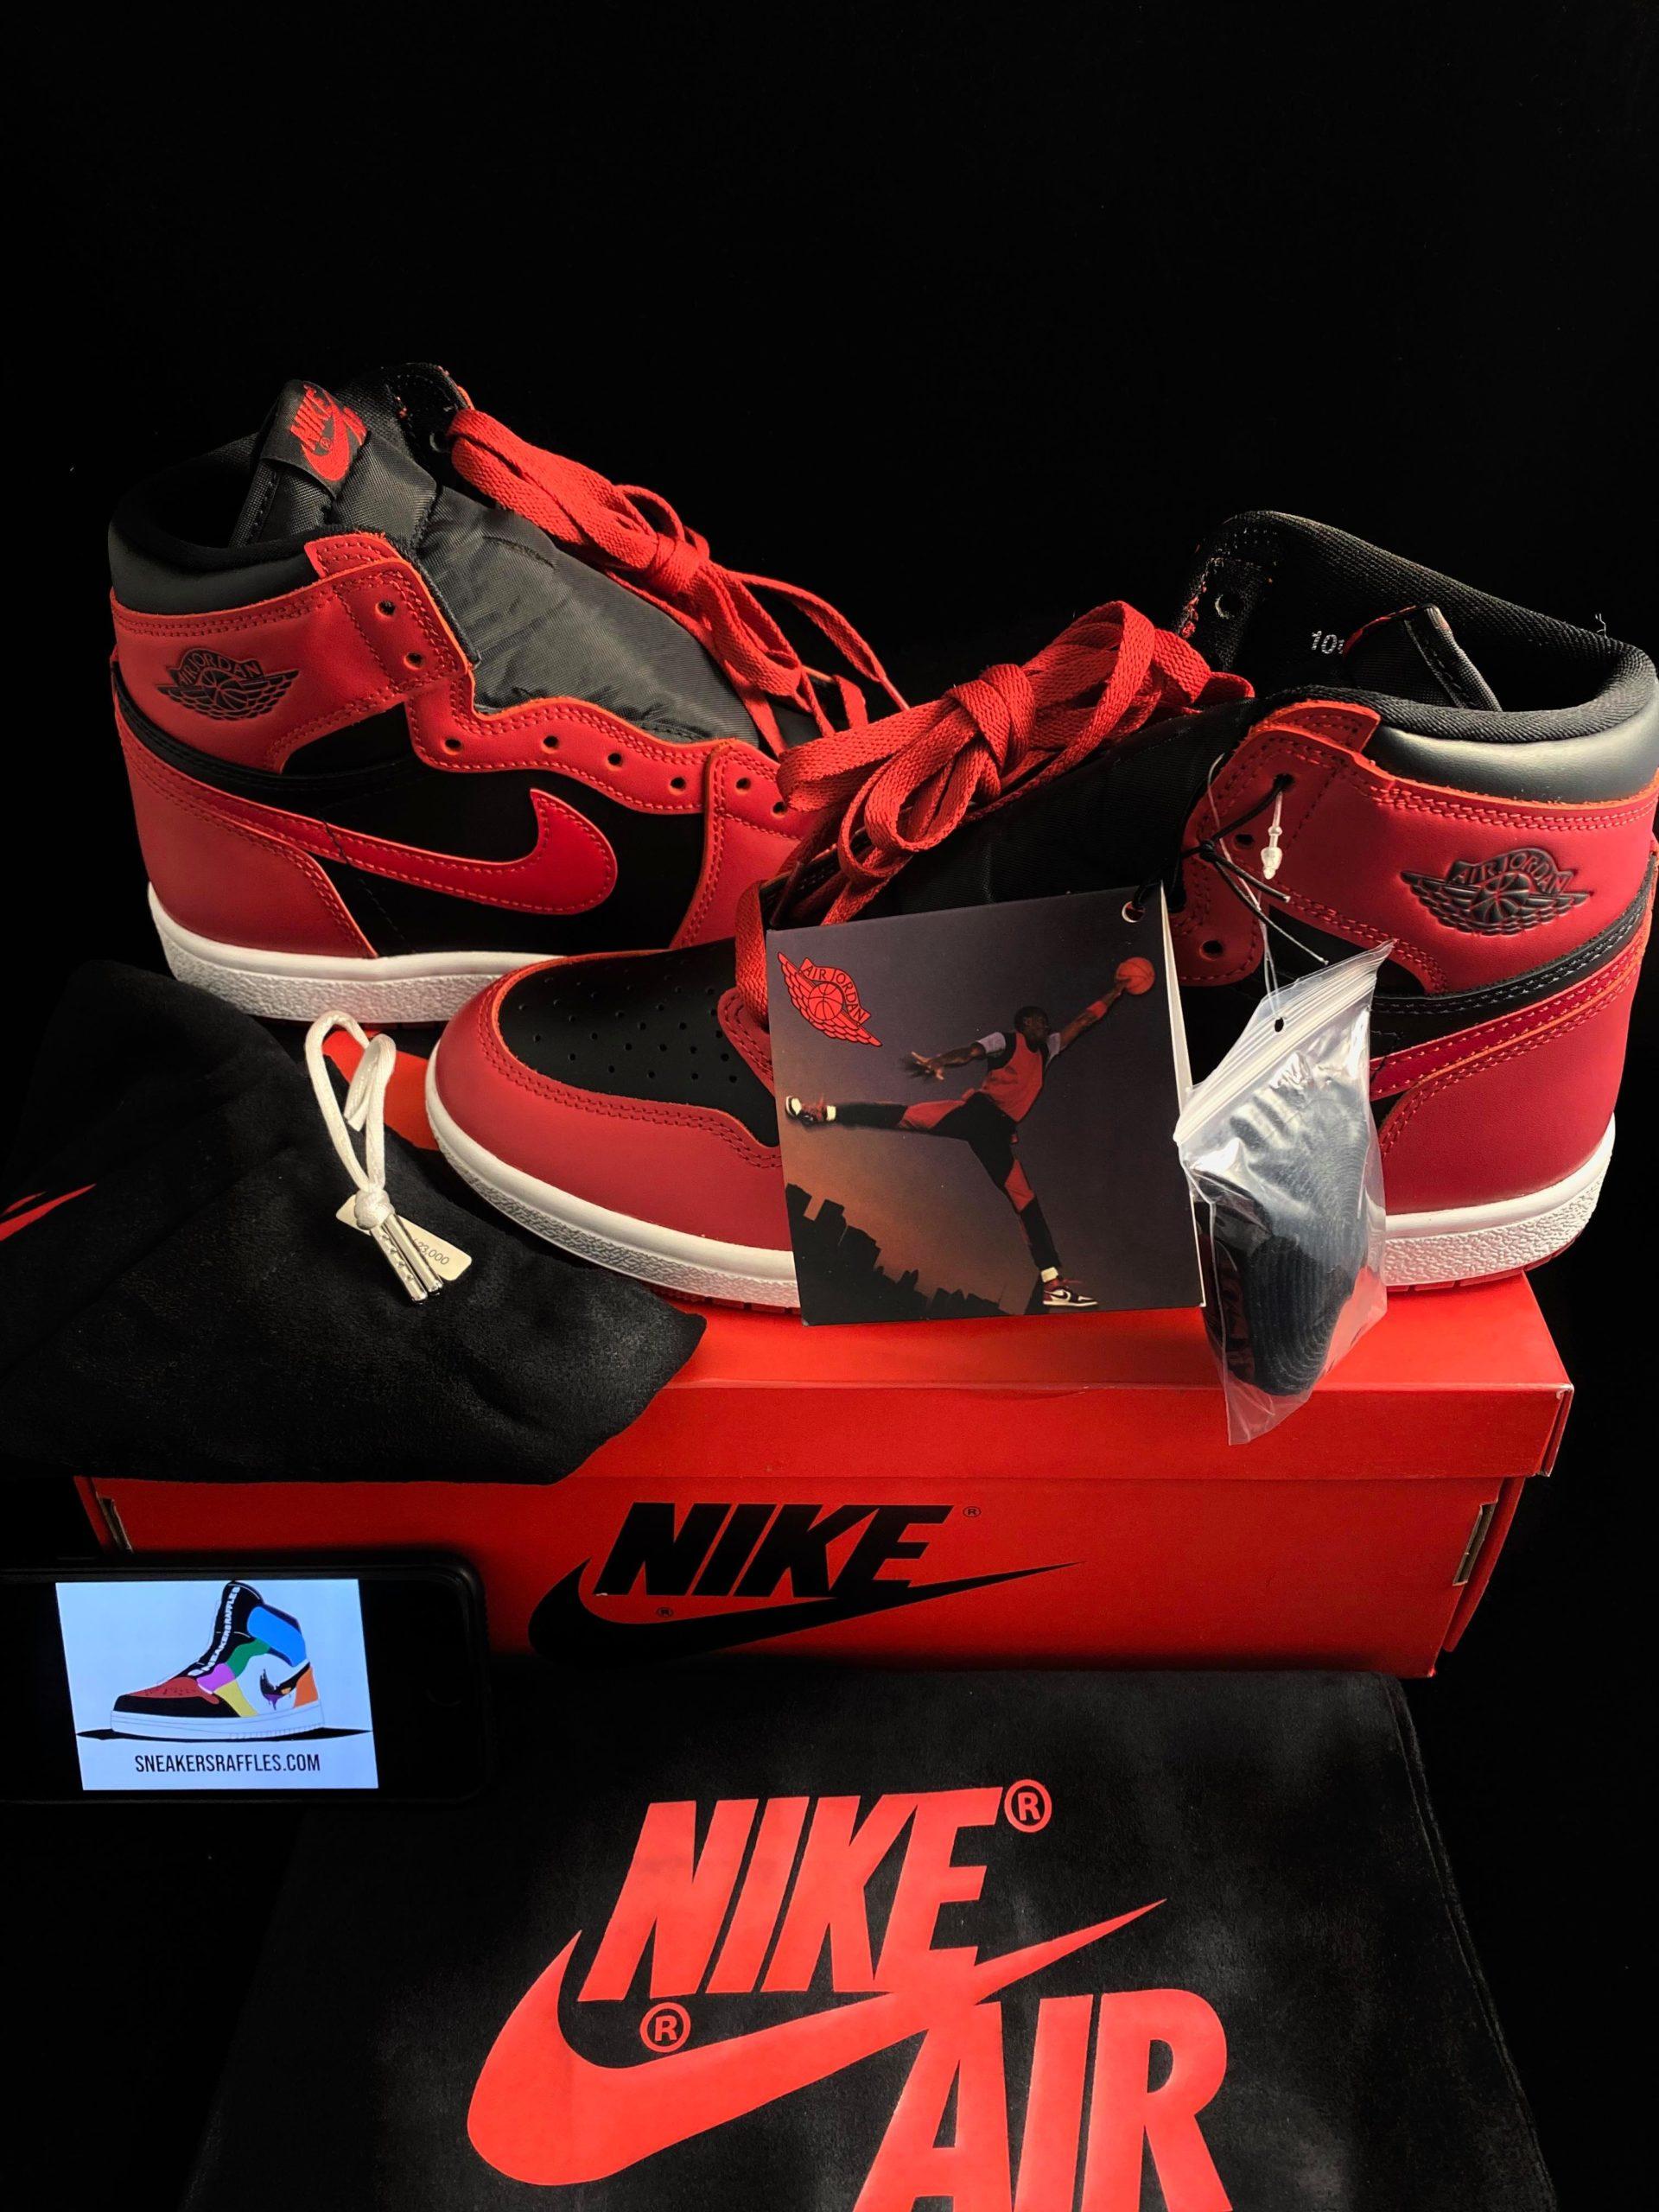 Nike Air Jordan HIGH 85 REVERSE BRED on Box